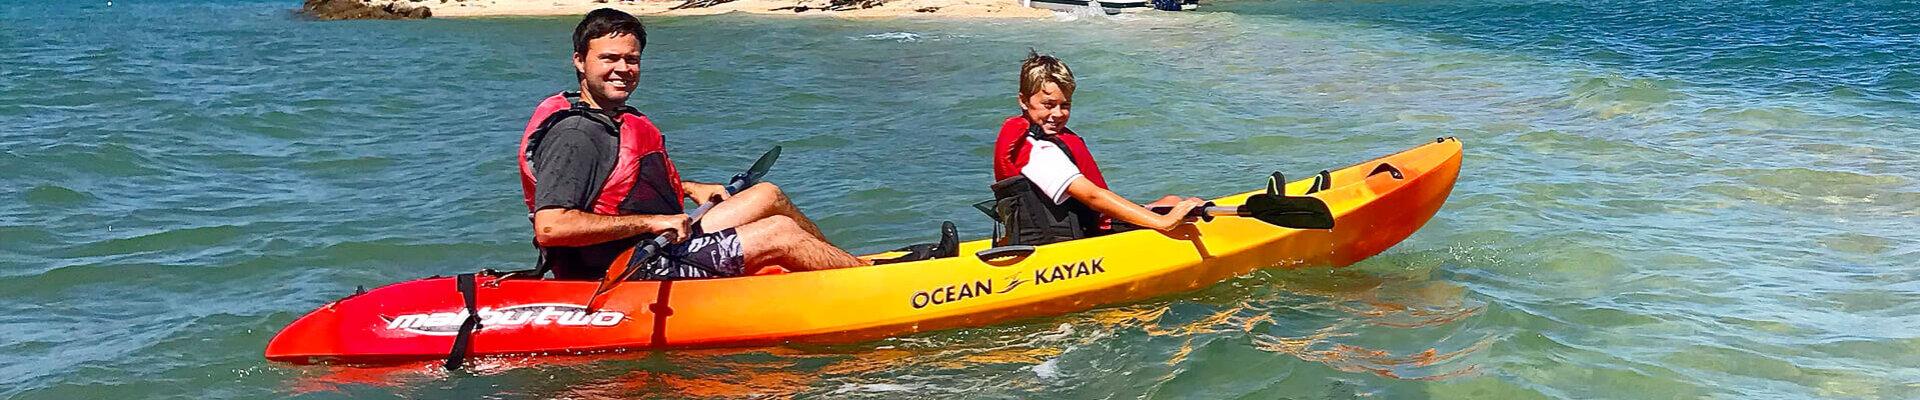 Kayak Rental Miami Beach Biscayne Bay